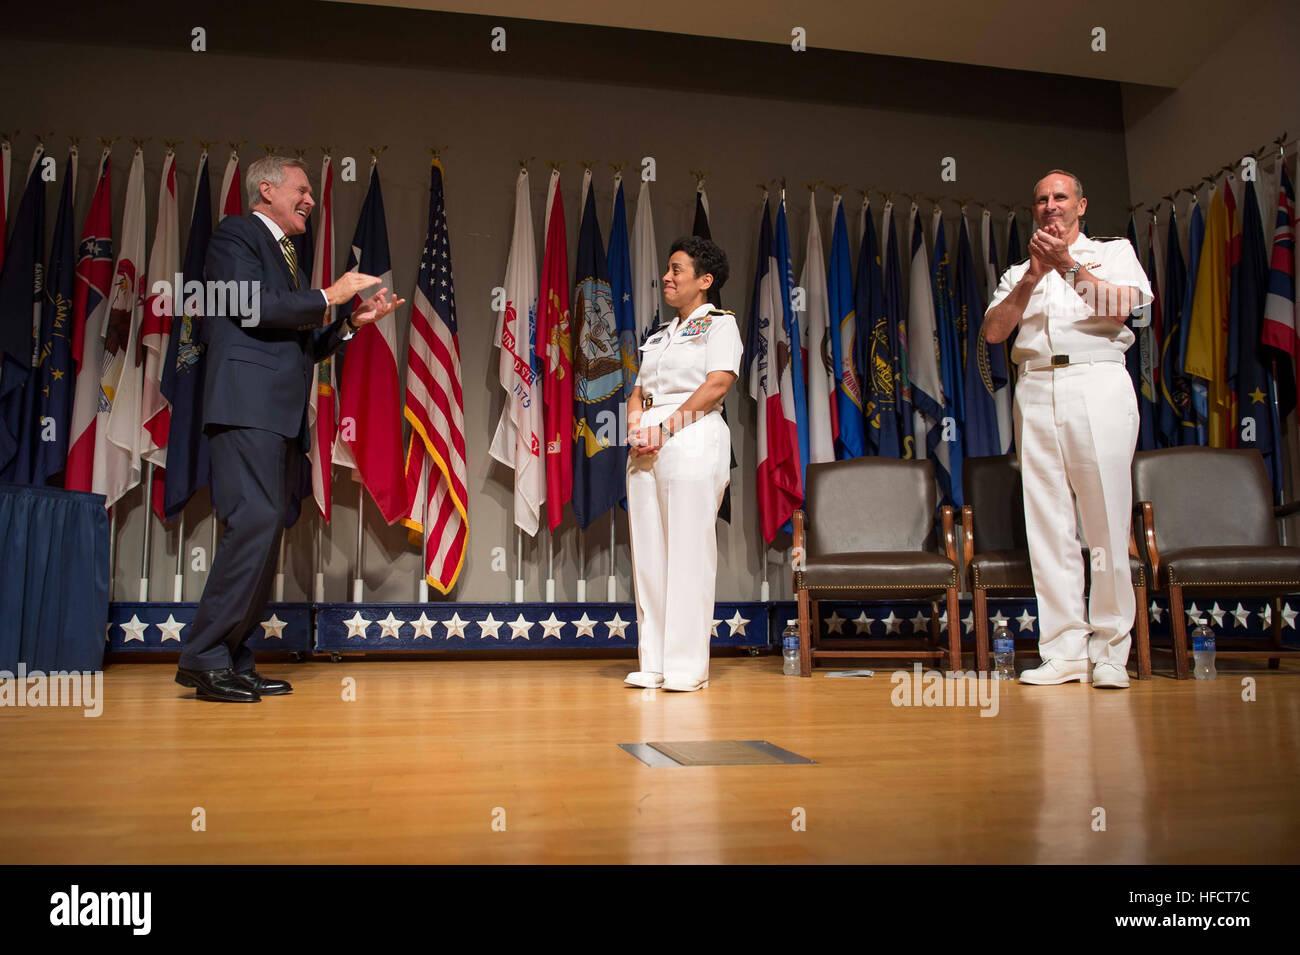 Secretary of the Navy Ray Mabus and Chief of Naval Operations (CNO) Adm. Jonathan Greenert applaud Adm. Michelle Stock Photo